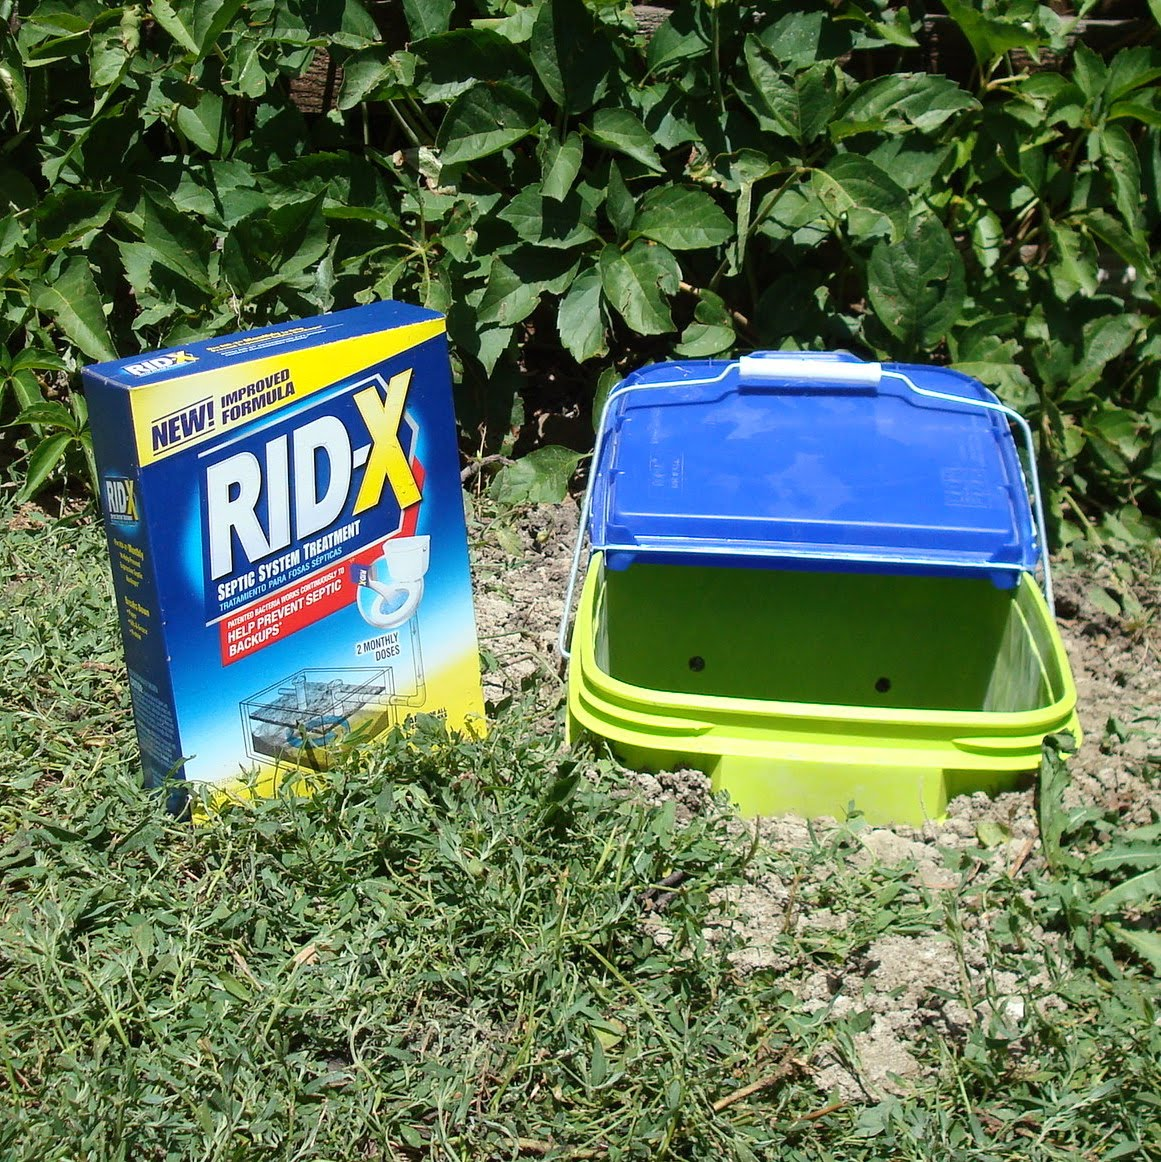 Diy Compost Bin Trash Can: Calico Road: Dog Doo Compost Bin